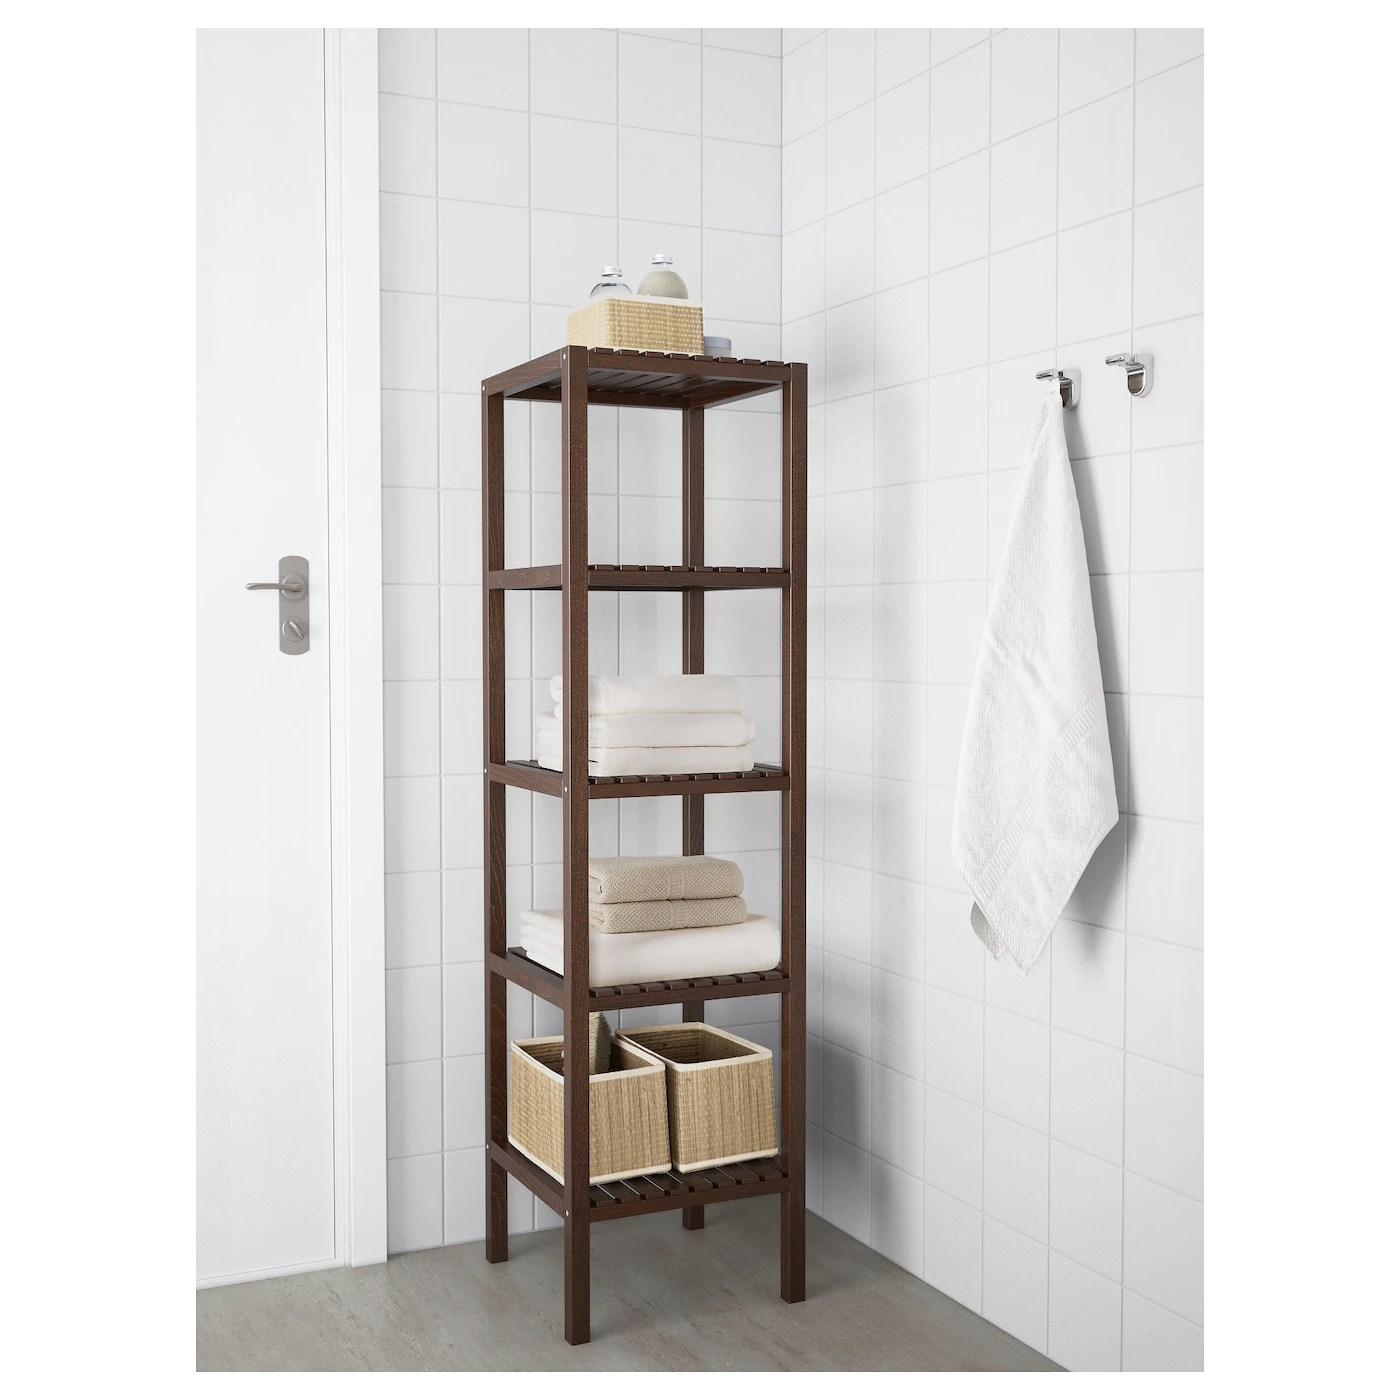 MOLGER Shelving unit Dark brown 37x140 cm  IKEA